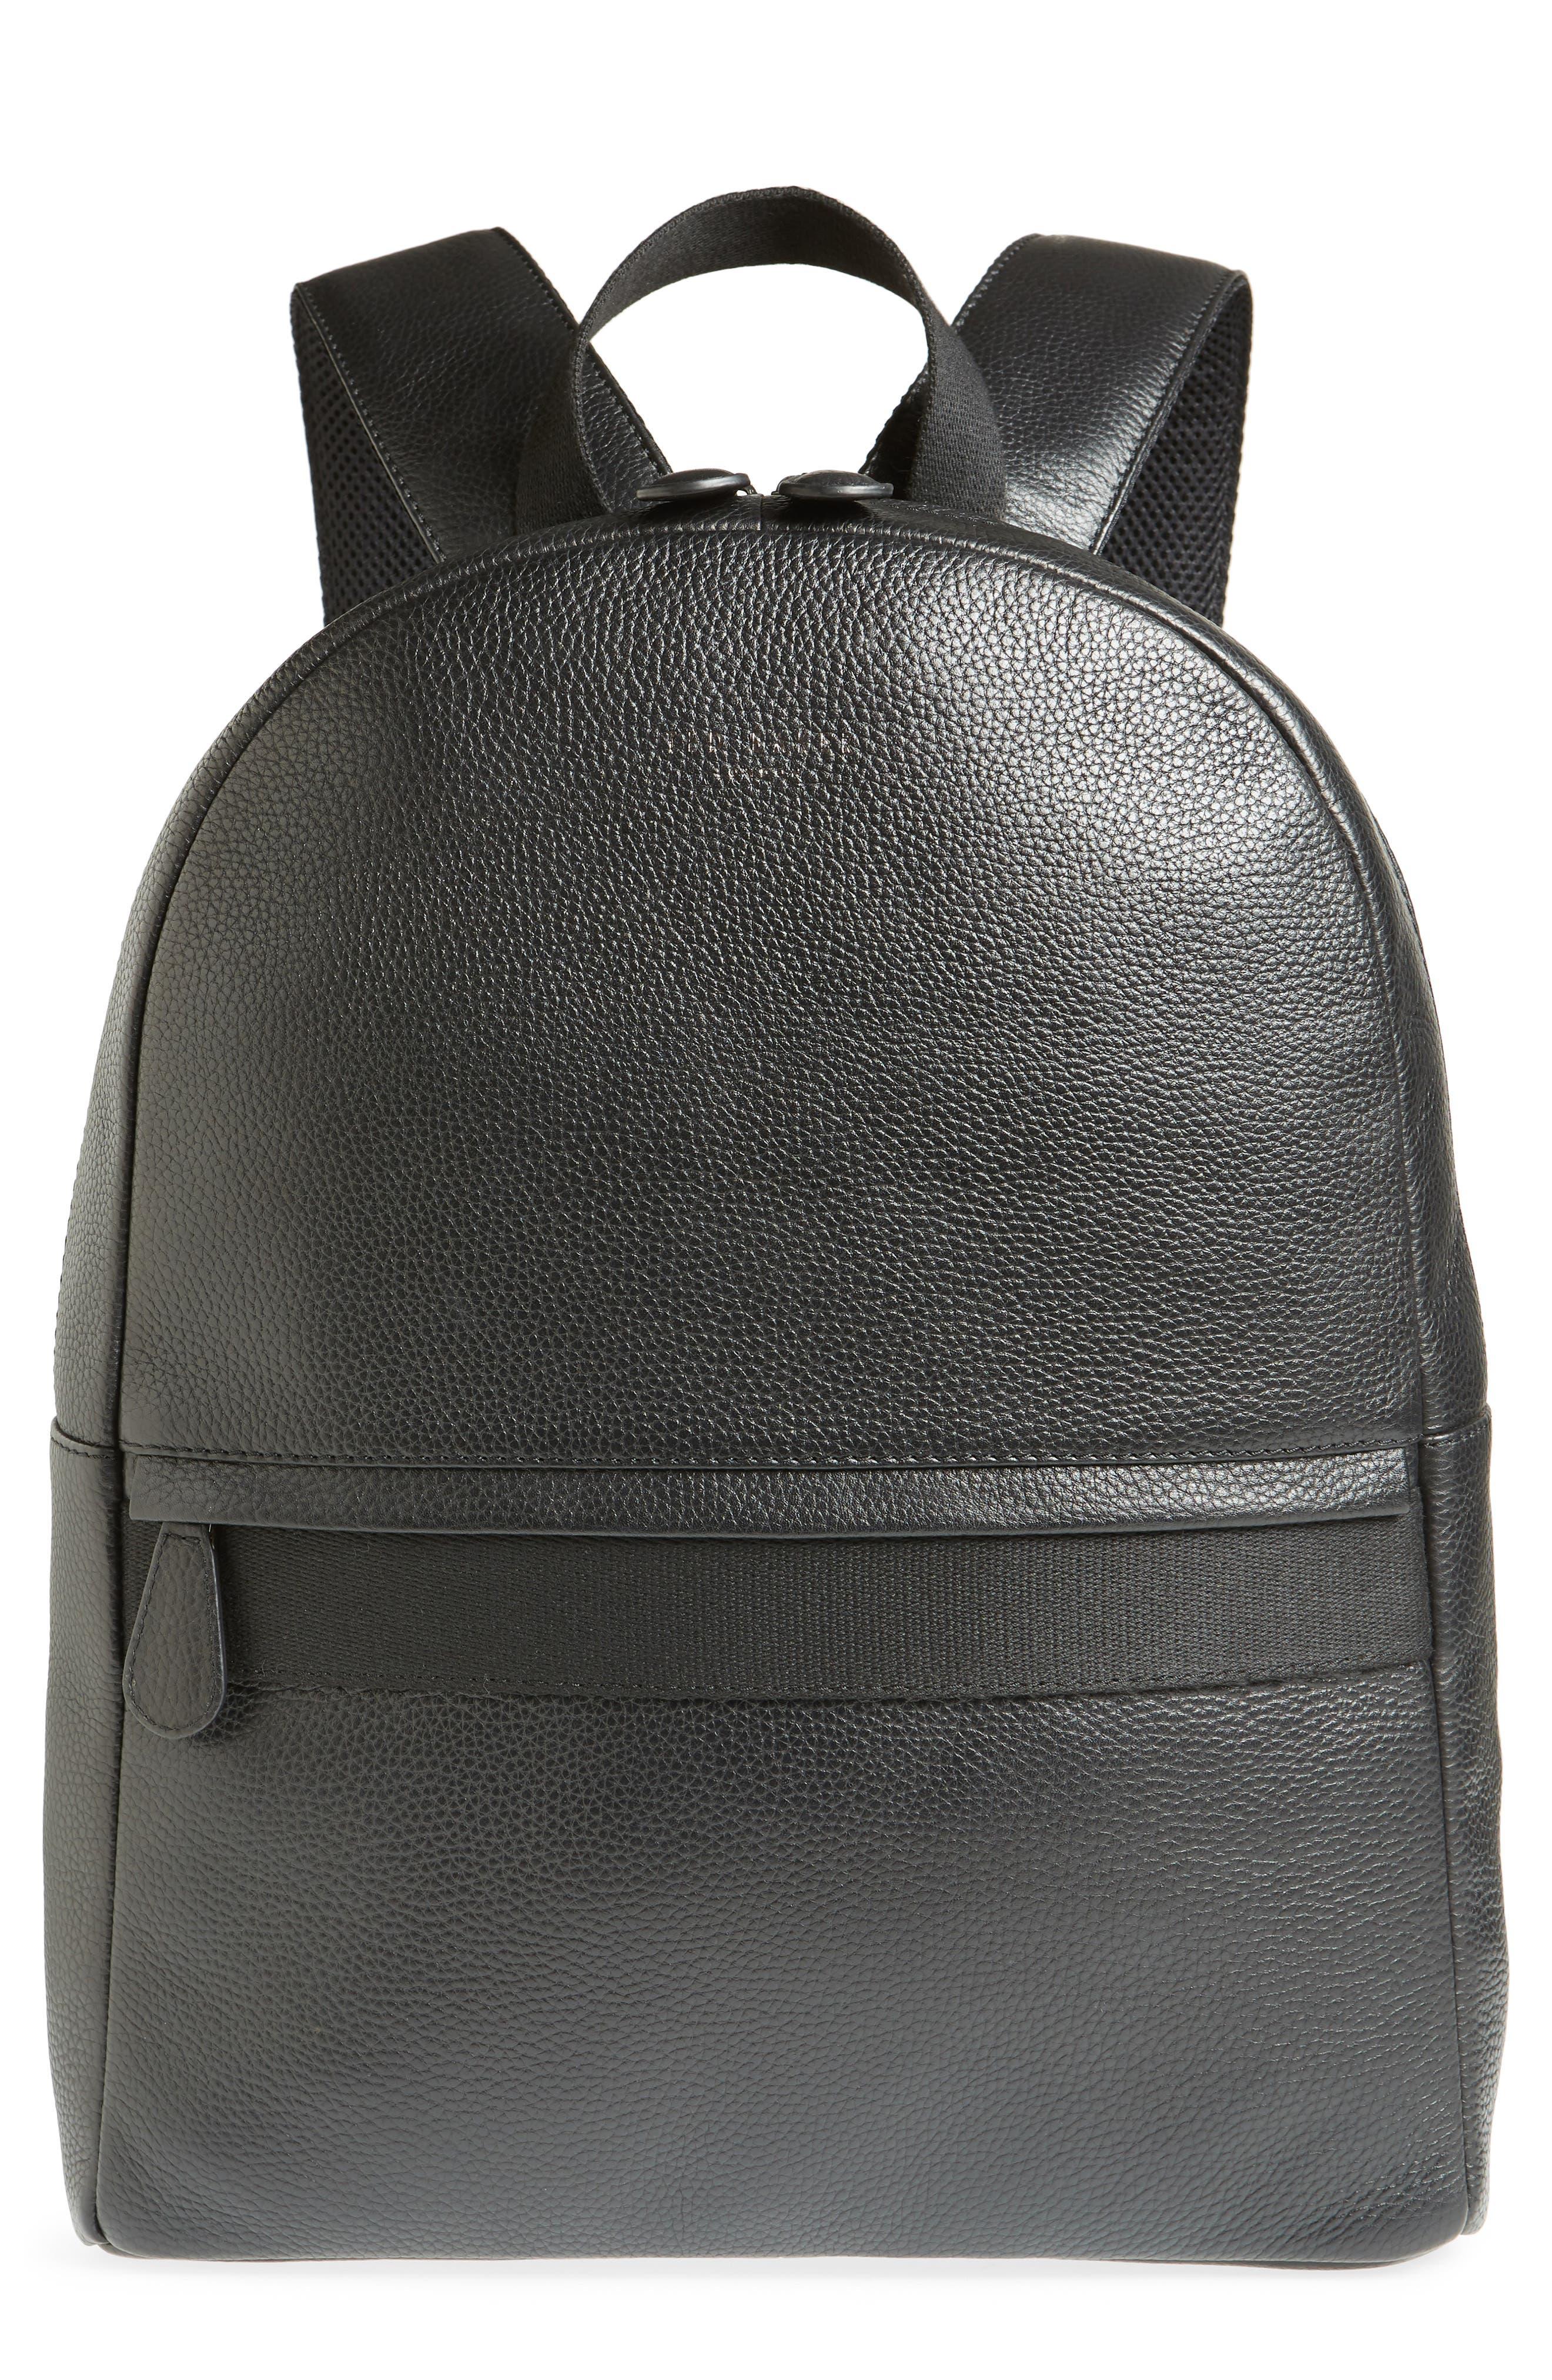 Rickrak Leather Backpack,                             Main thumbnail 1, color,                             BLACK